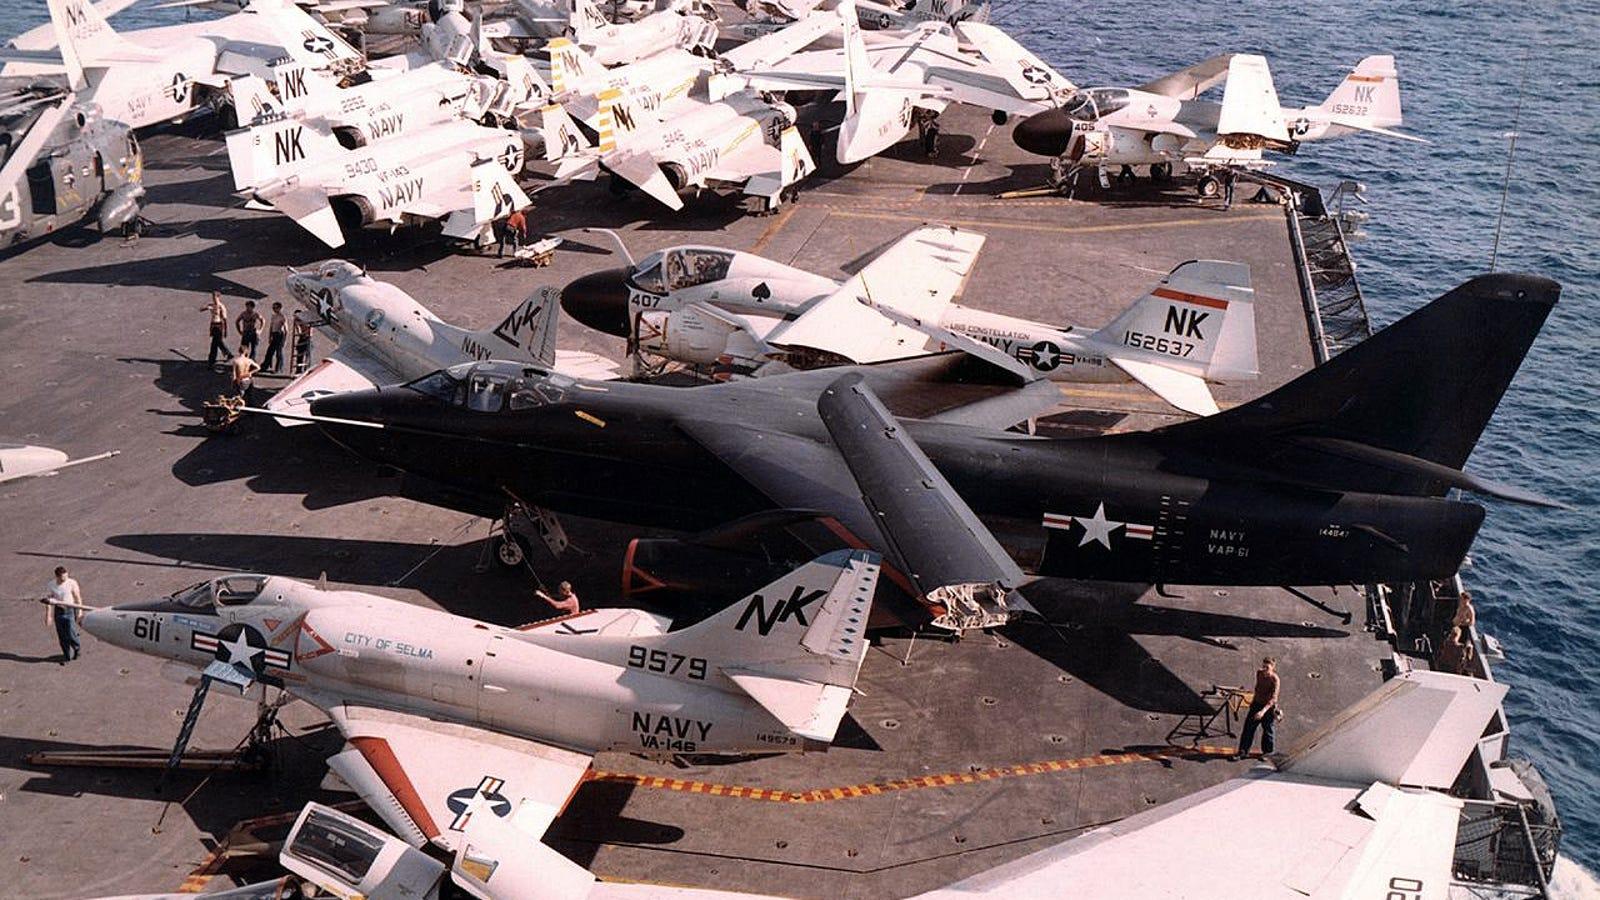 A10 Warthog Thunderbolt T Shirt US Air Force Military Aircraft Size XLT to 4XLT